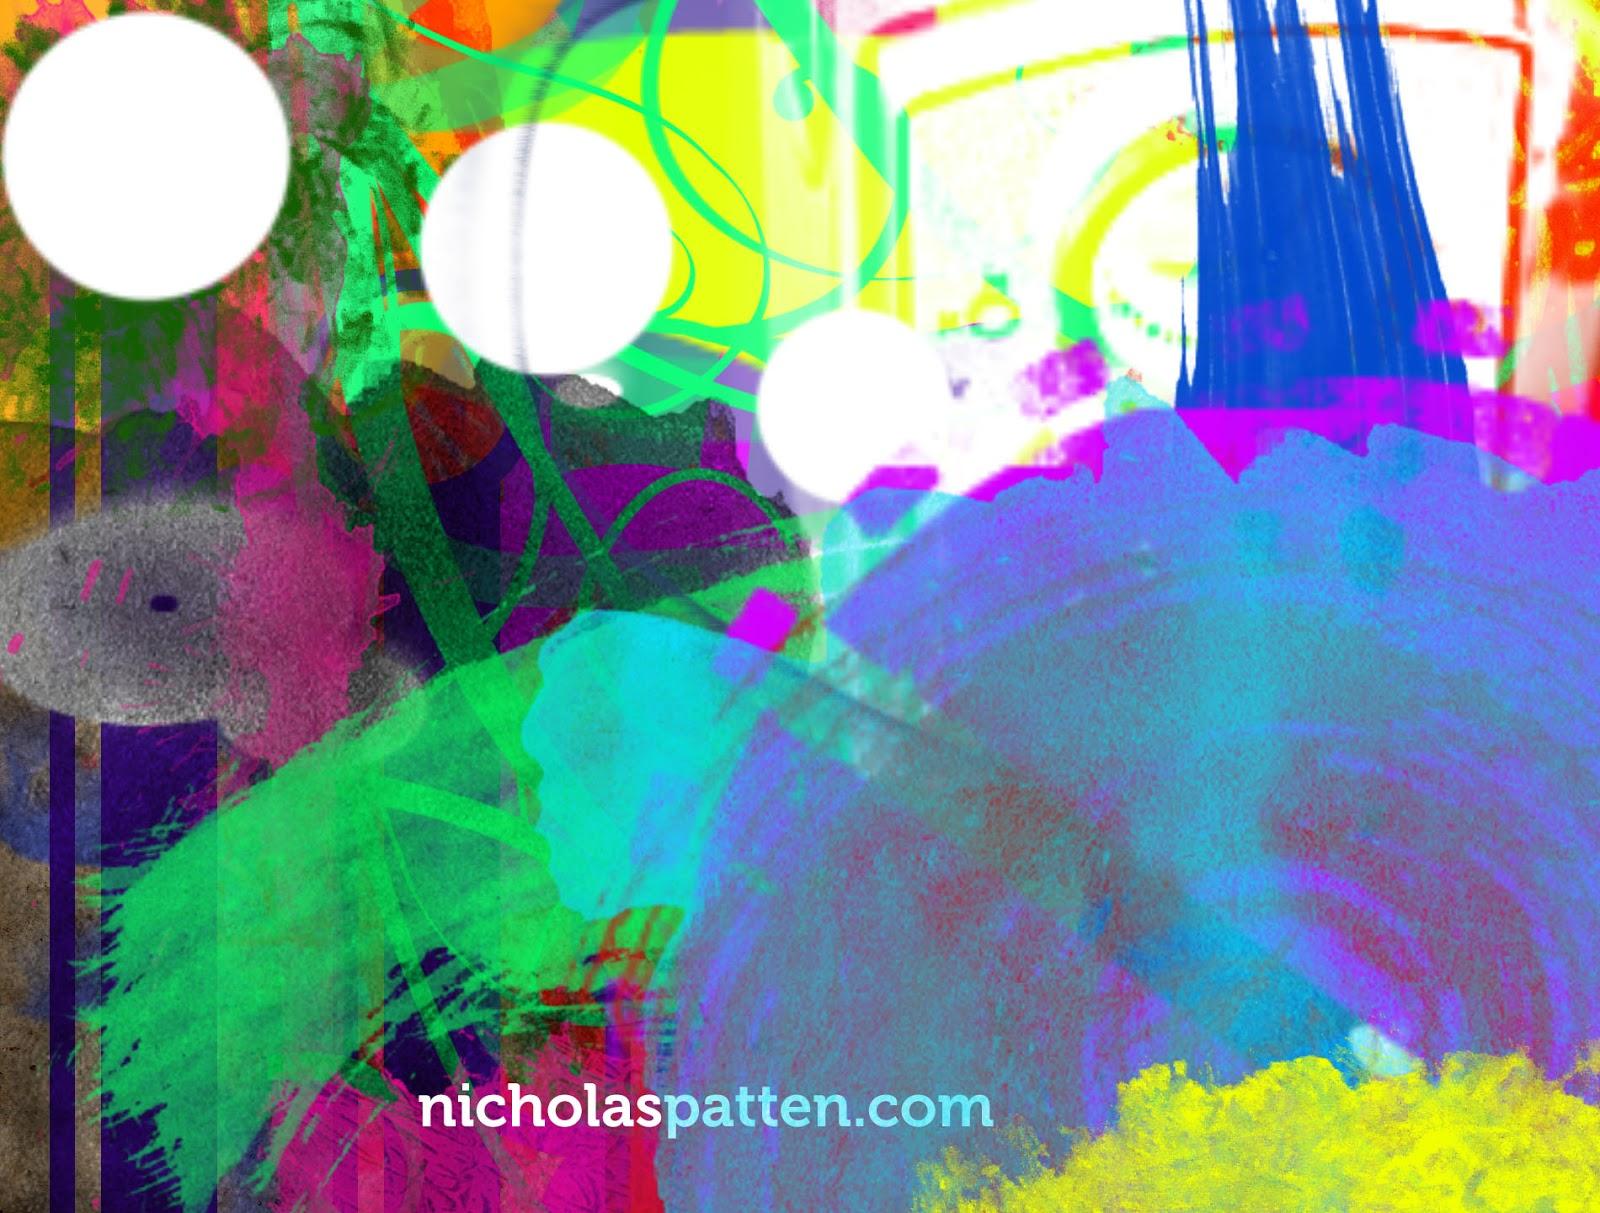 http://4.bp.blogspot.com/-SBhCAd3NtdM/UKZ55L1S1II/AAAAAAAADro/mdfiNPrxlPA/s1600/wallpaper1.jpg